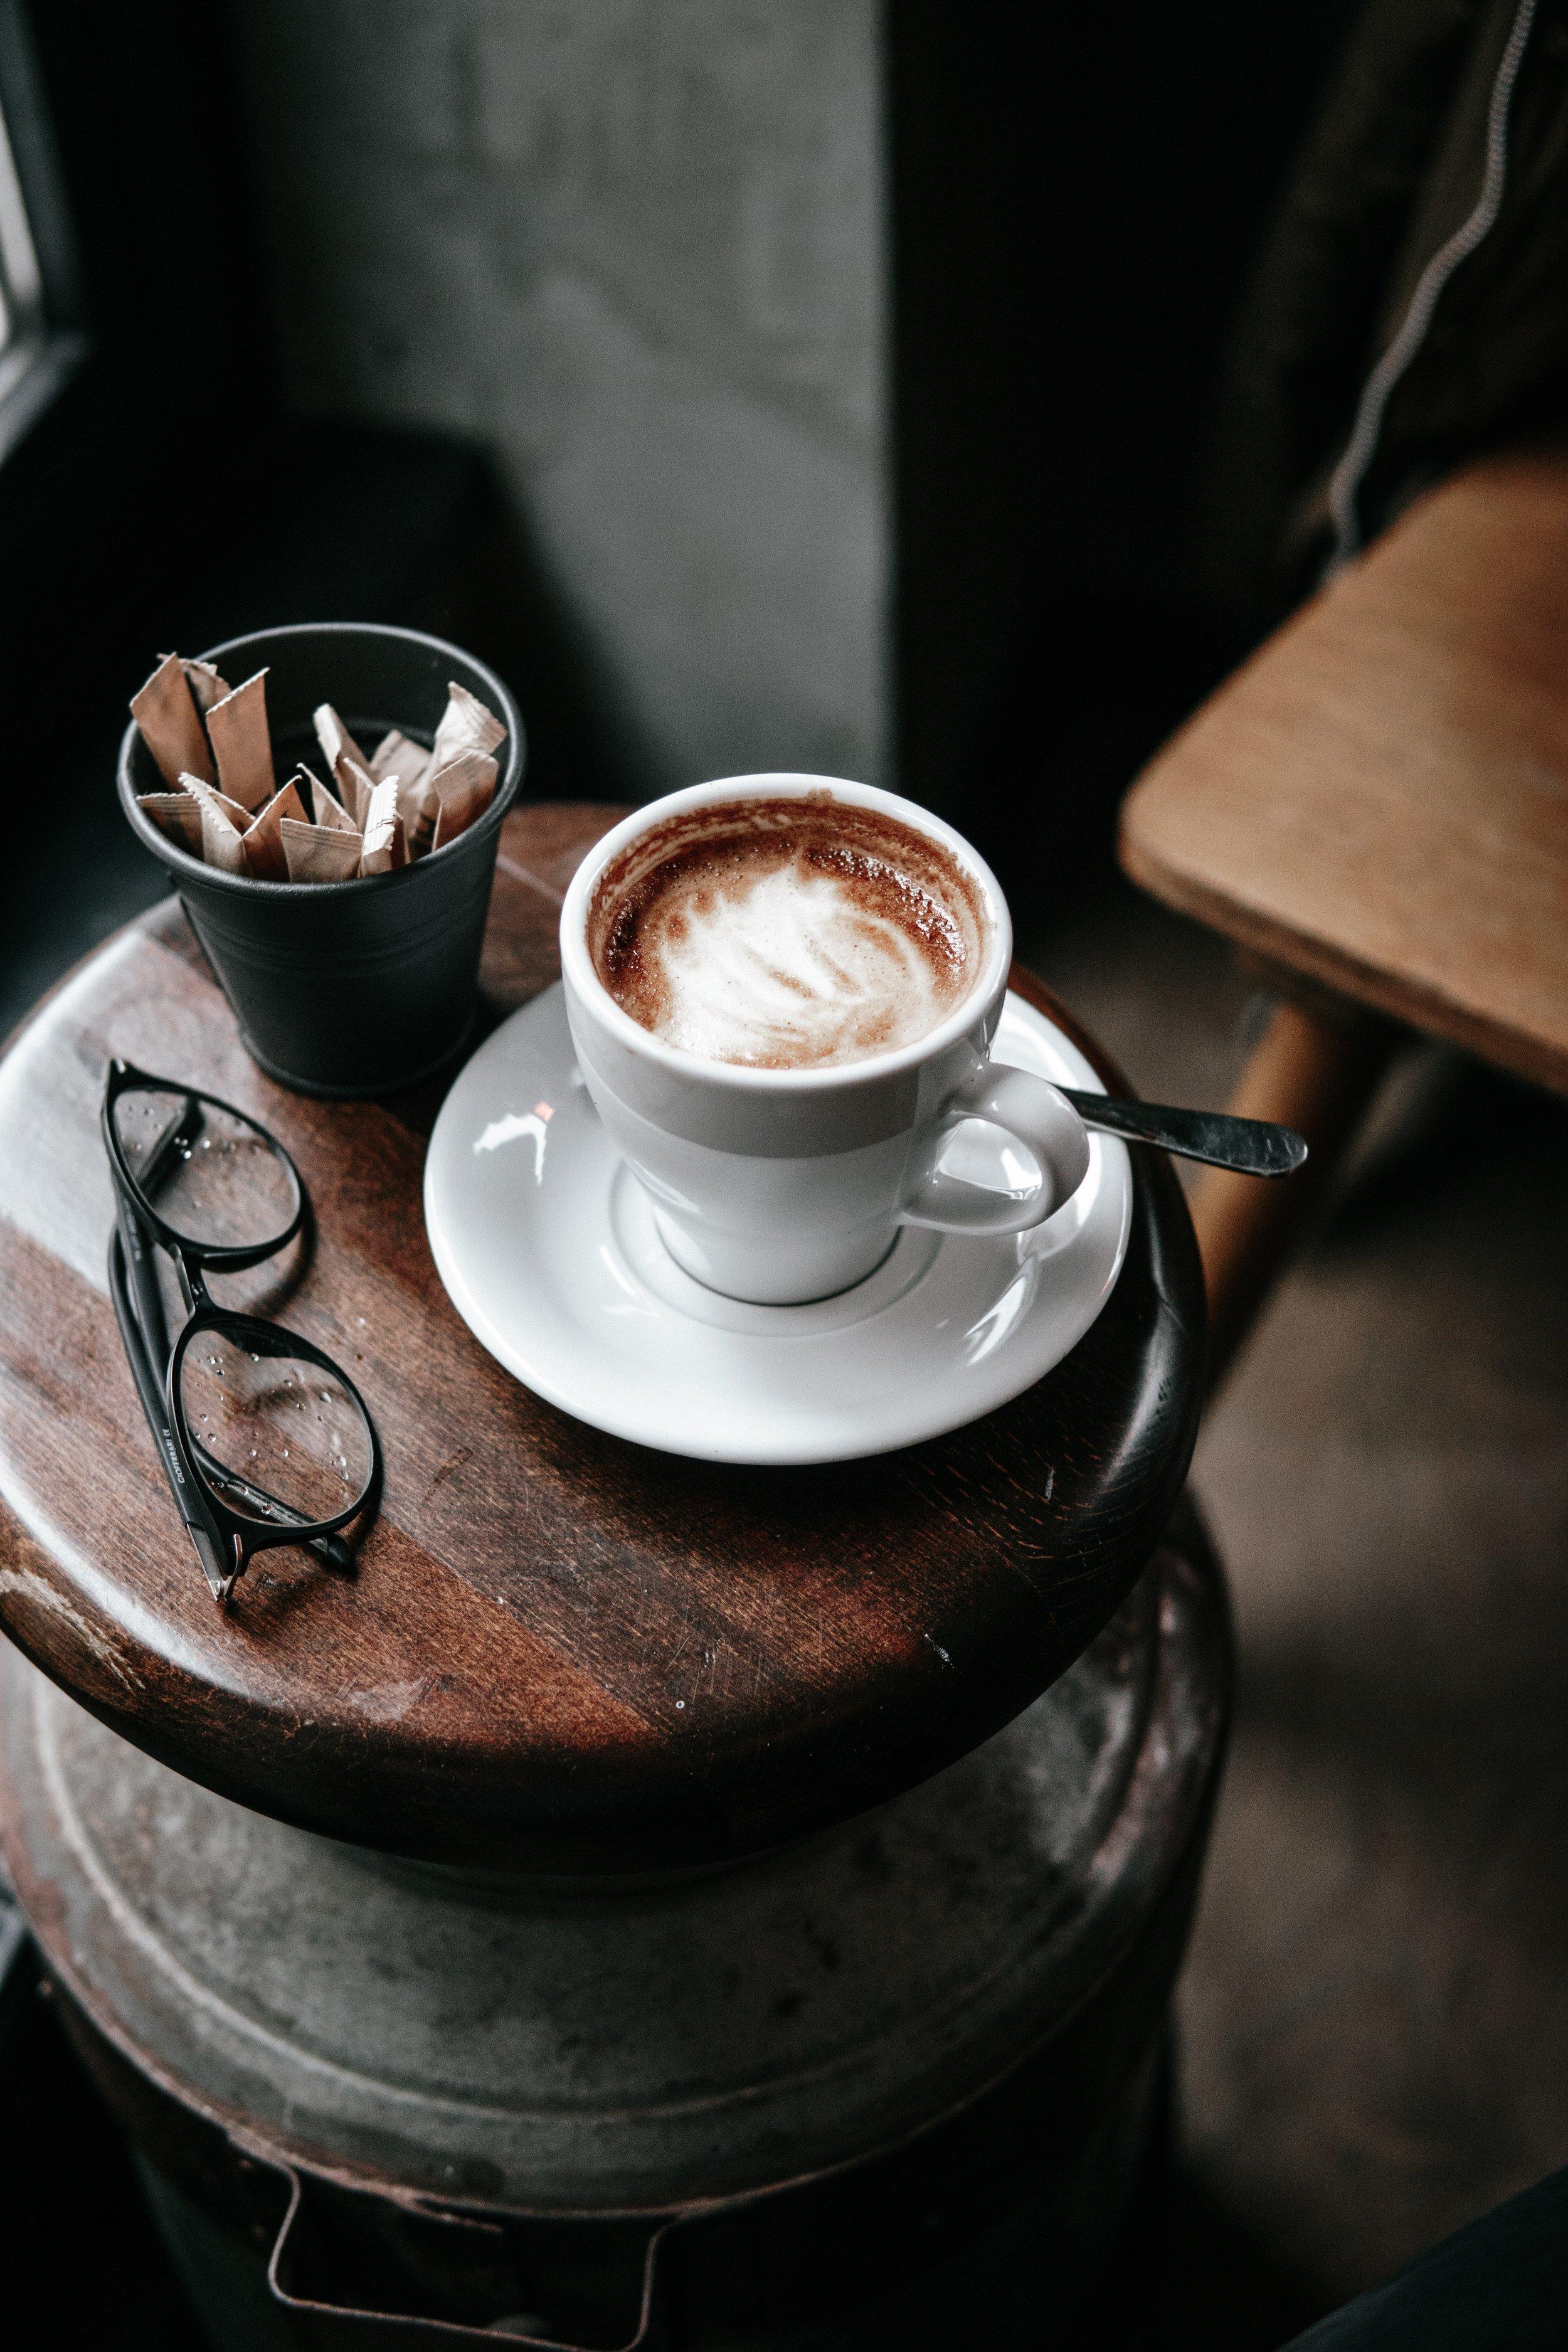 Coffee, obvz